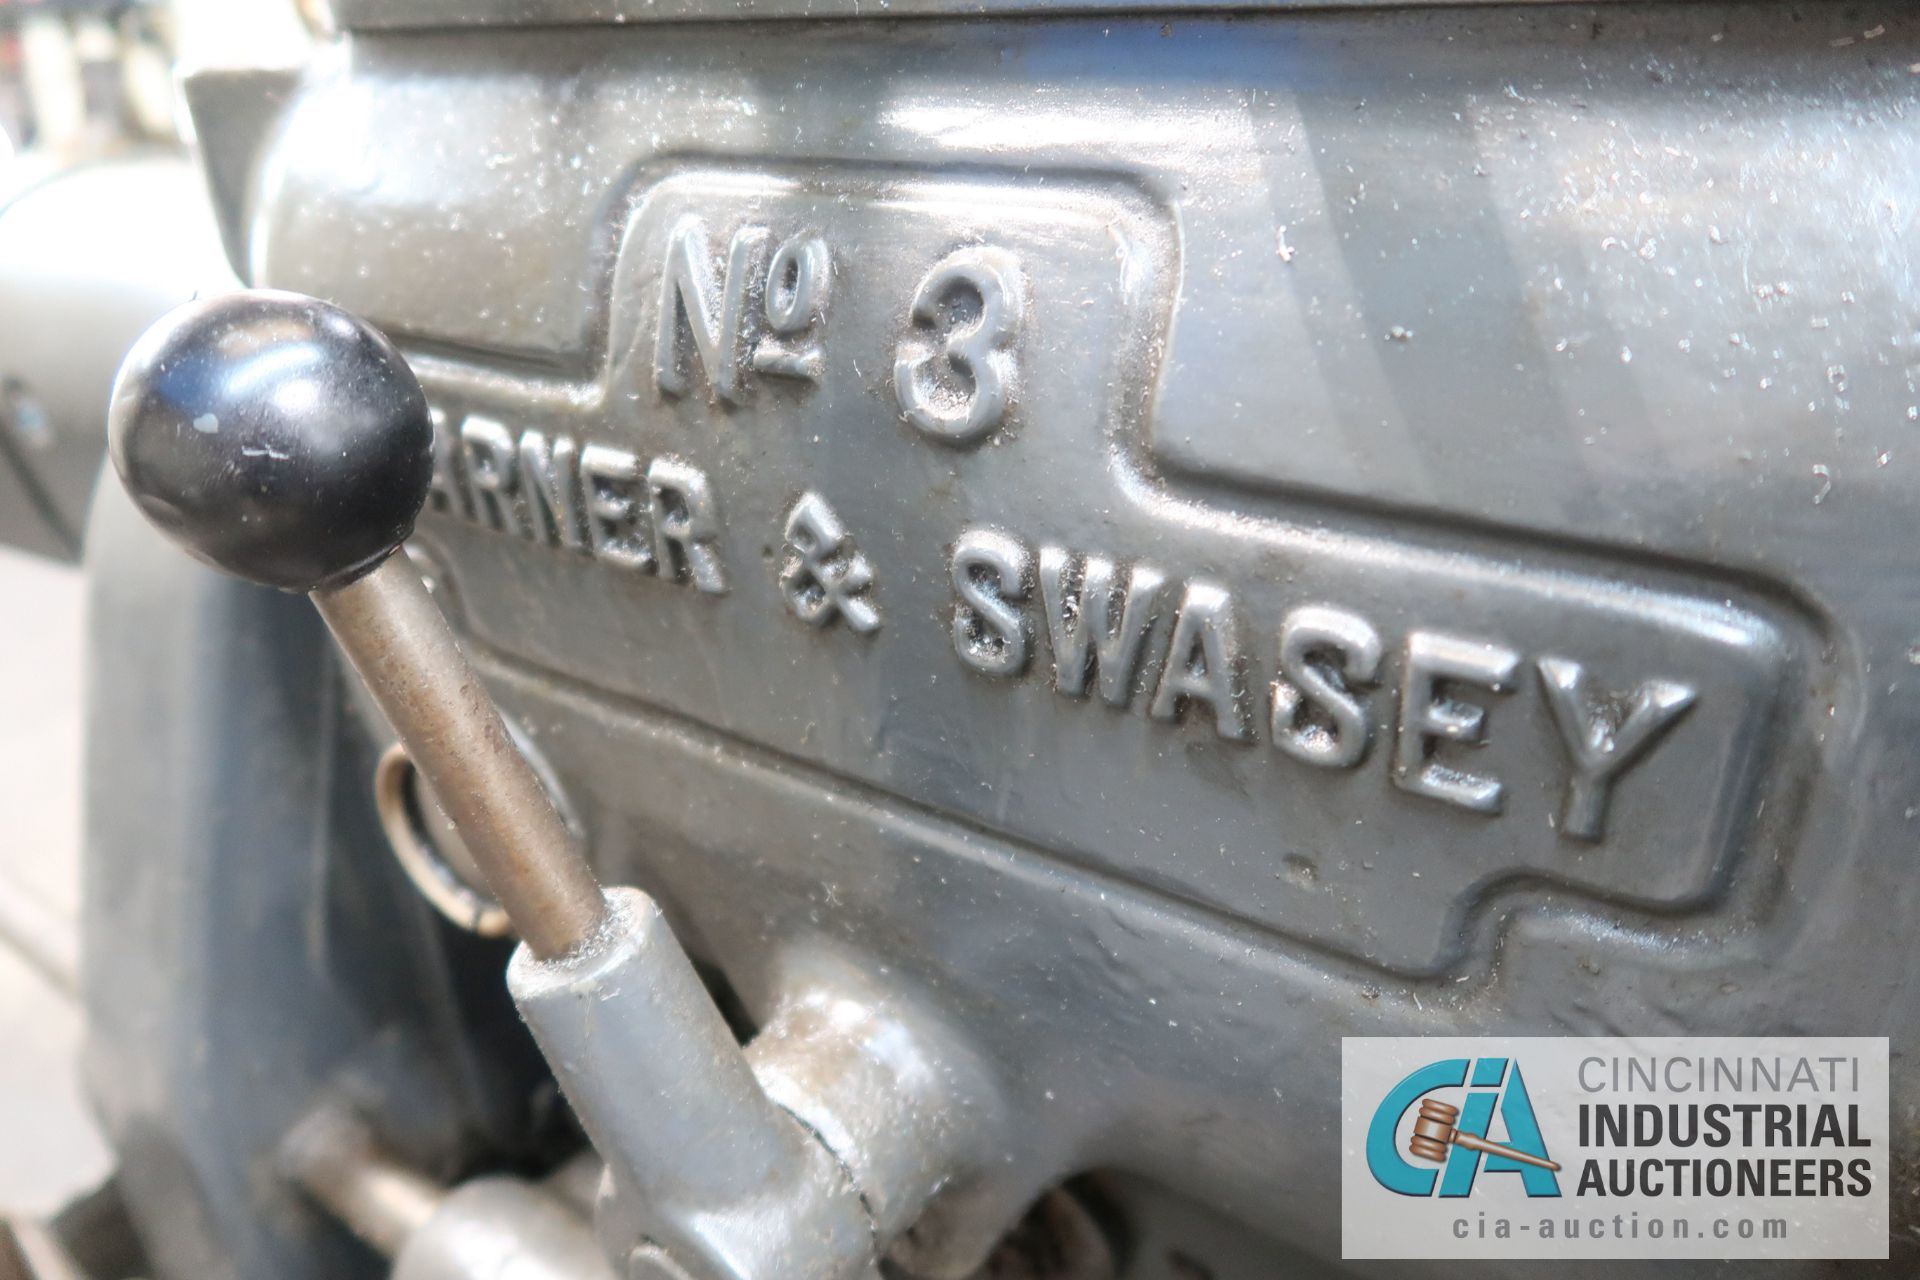 Lot 75 - (Former lot 28) WARNER AND SWASEY MODEL 3 LATHE; S/N 663697